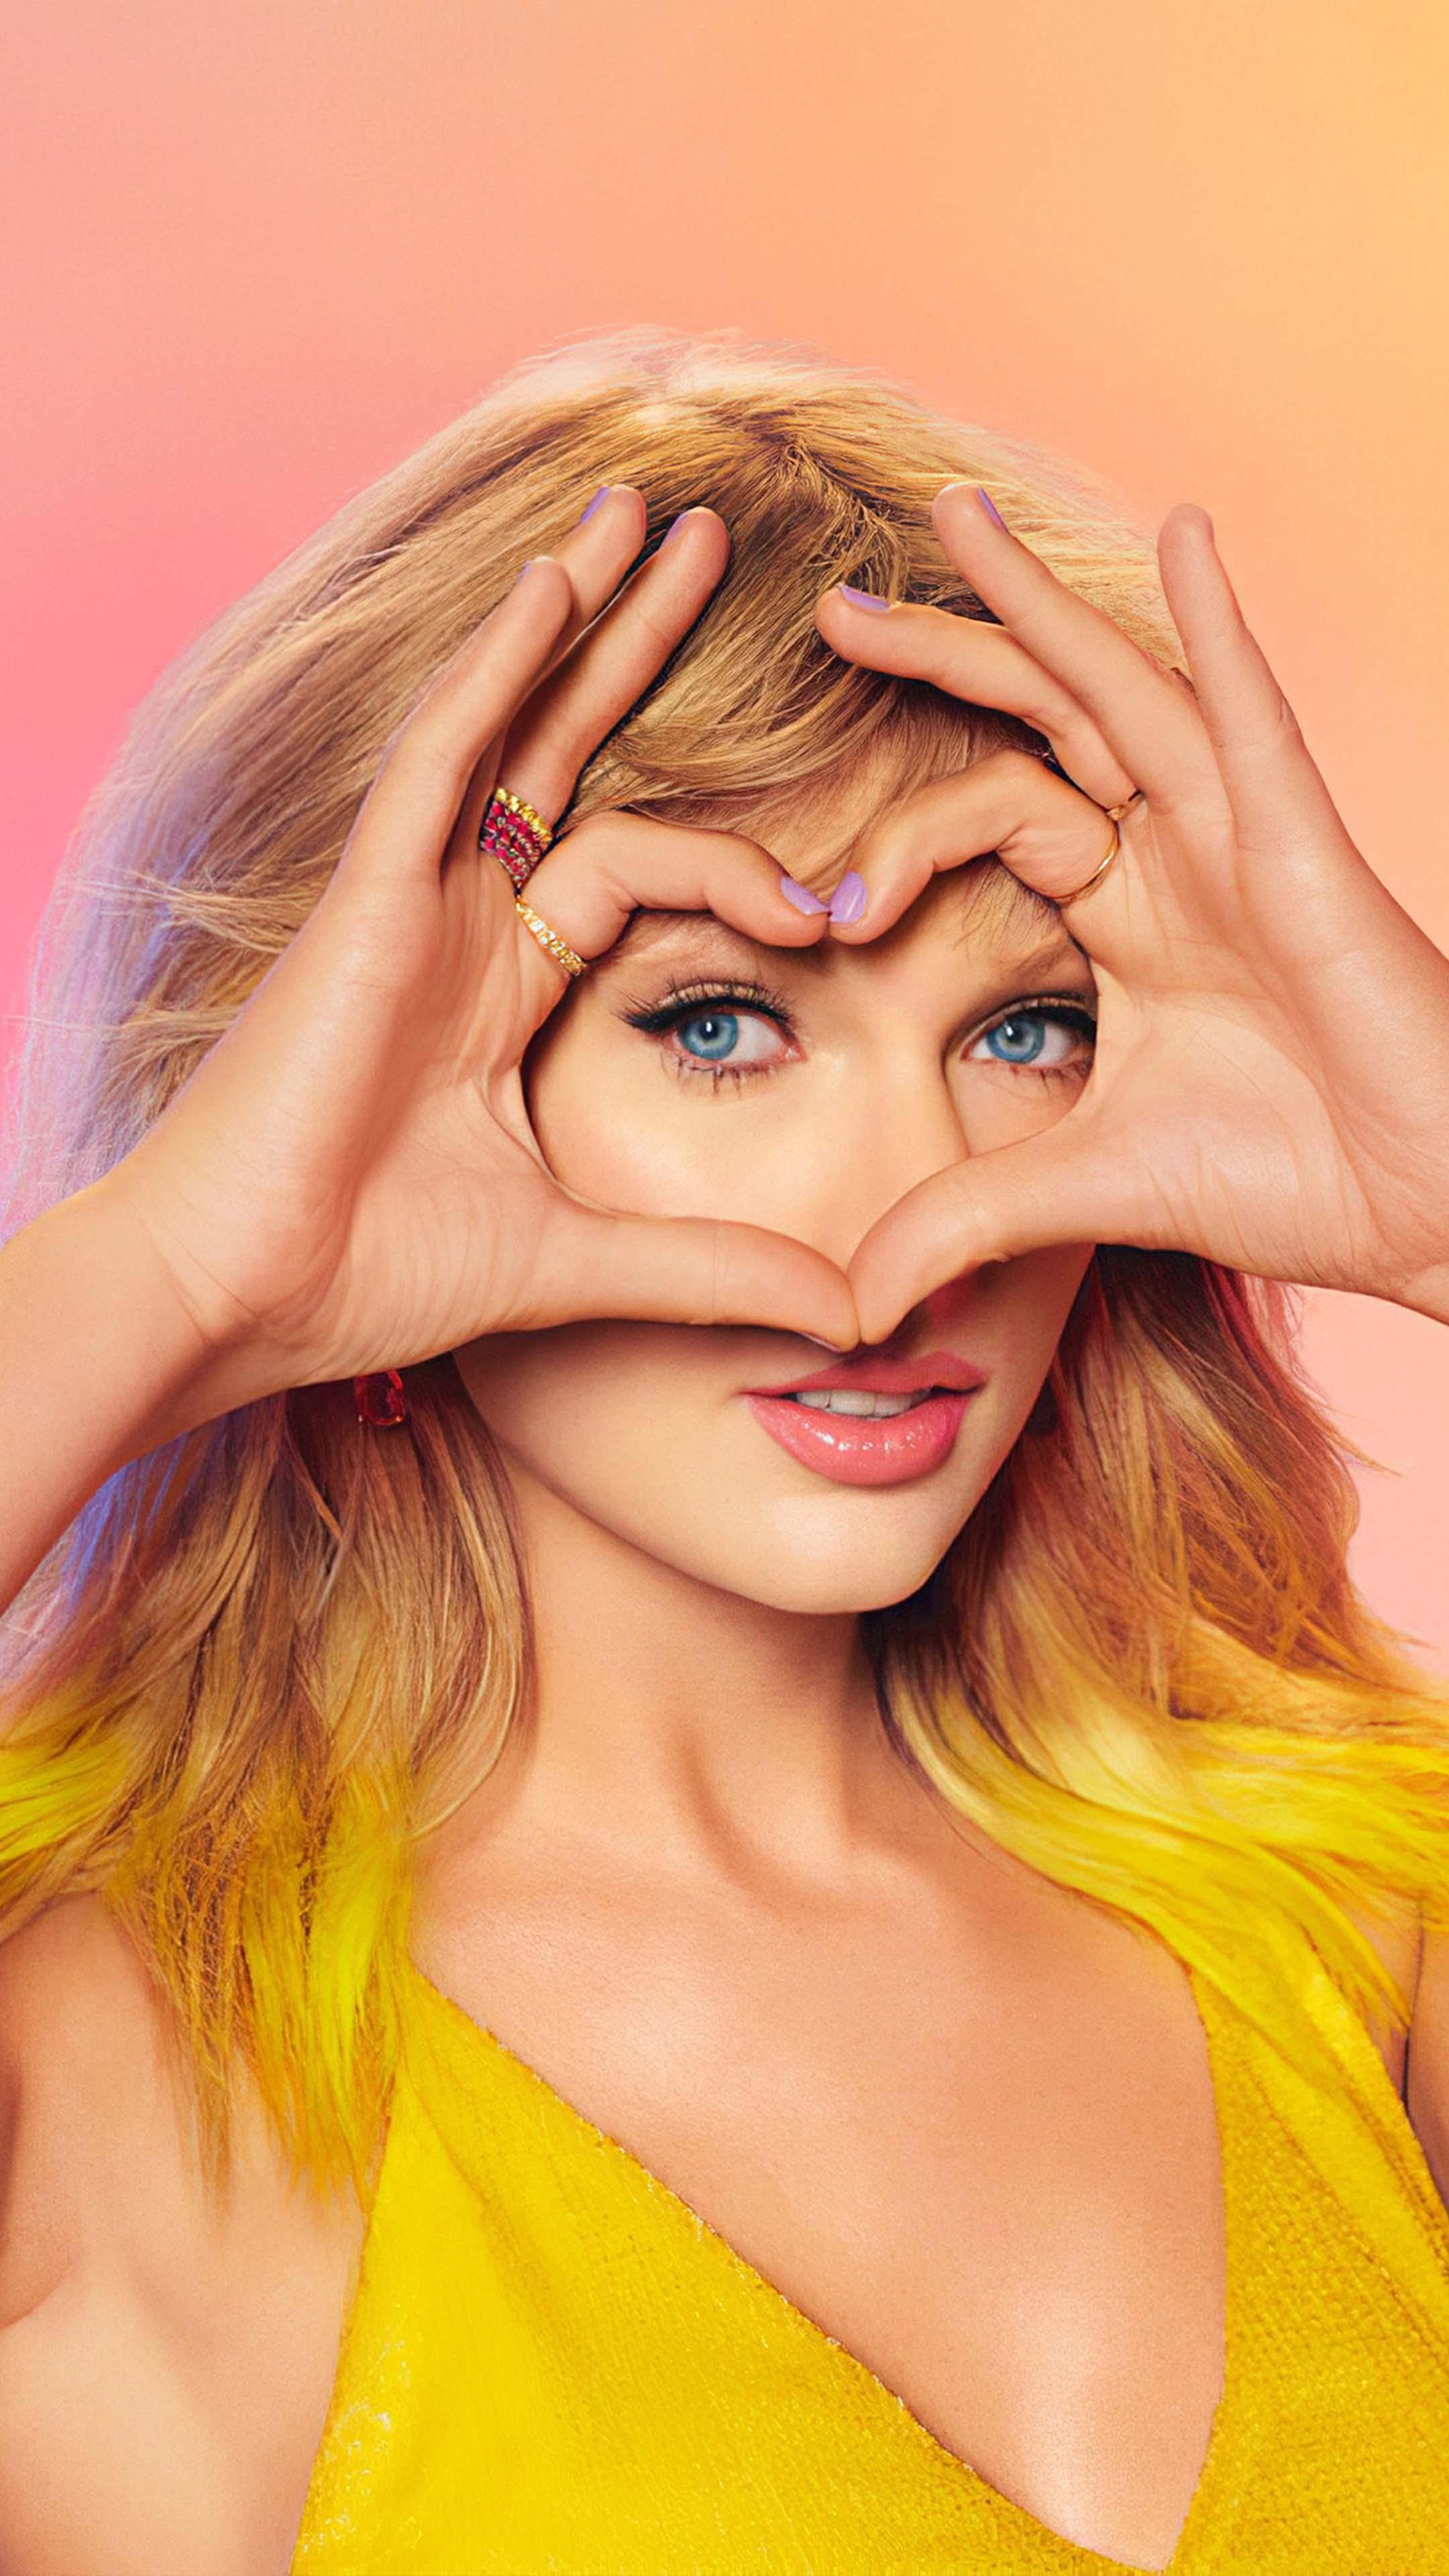 Taylor Swift Heart Shape With Hands 4k Ultra Hd Mobile Wallpaper